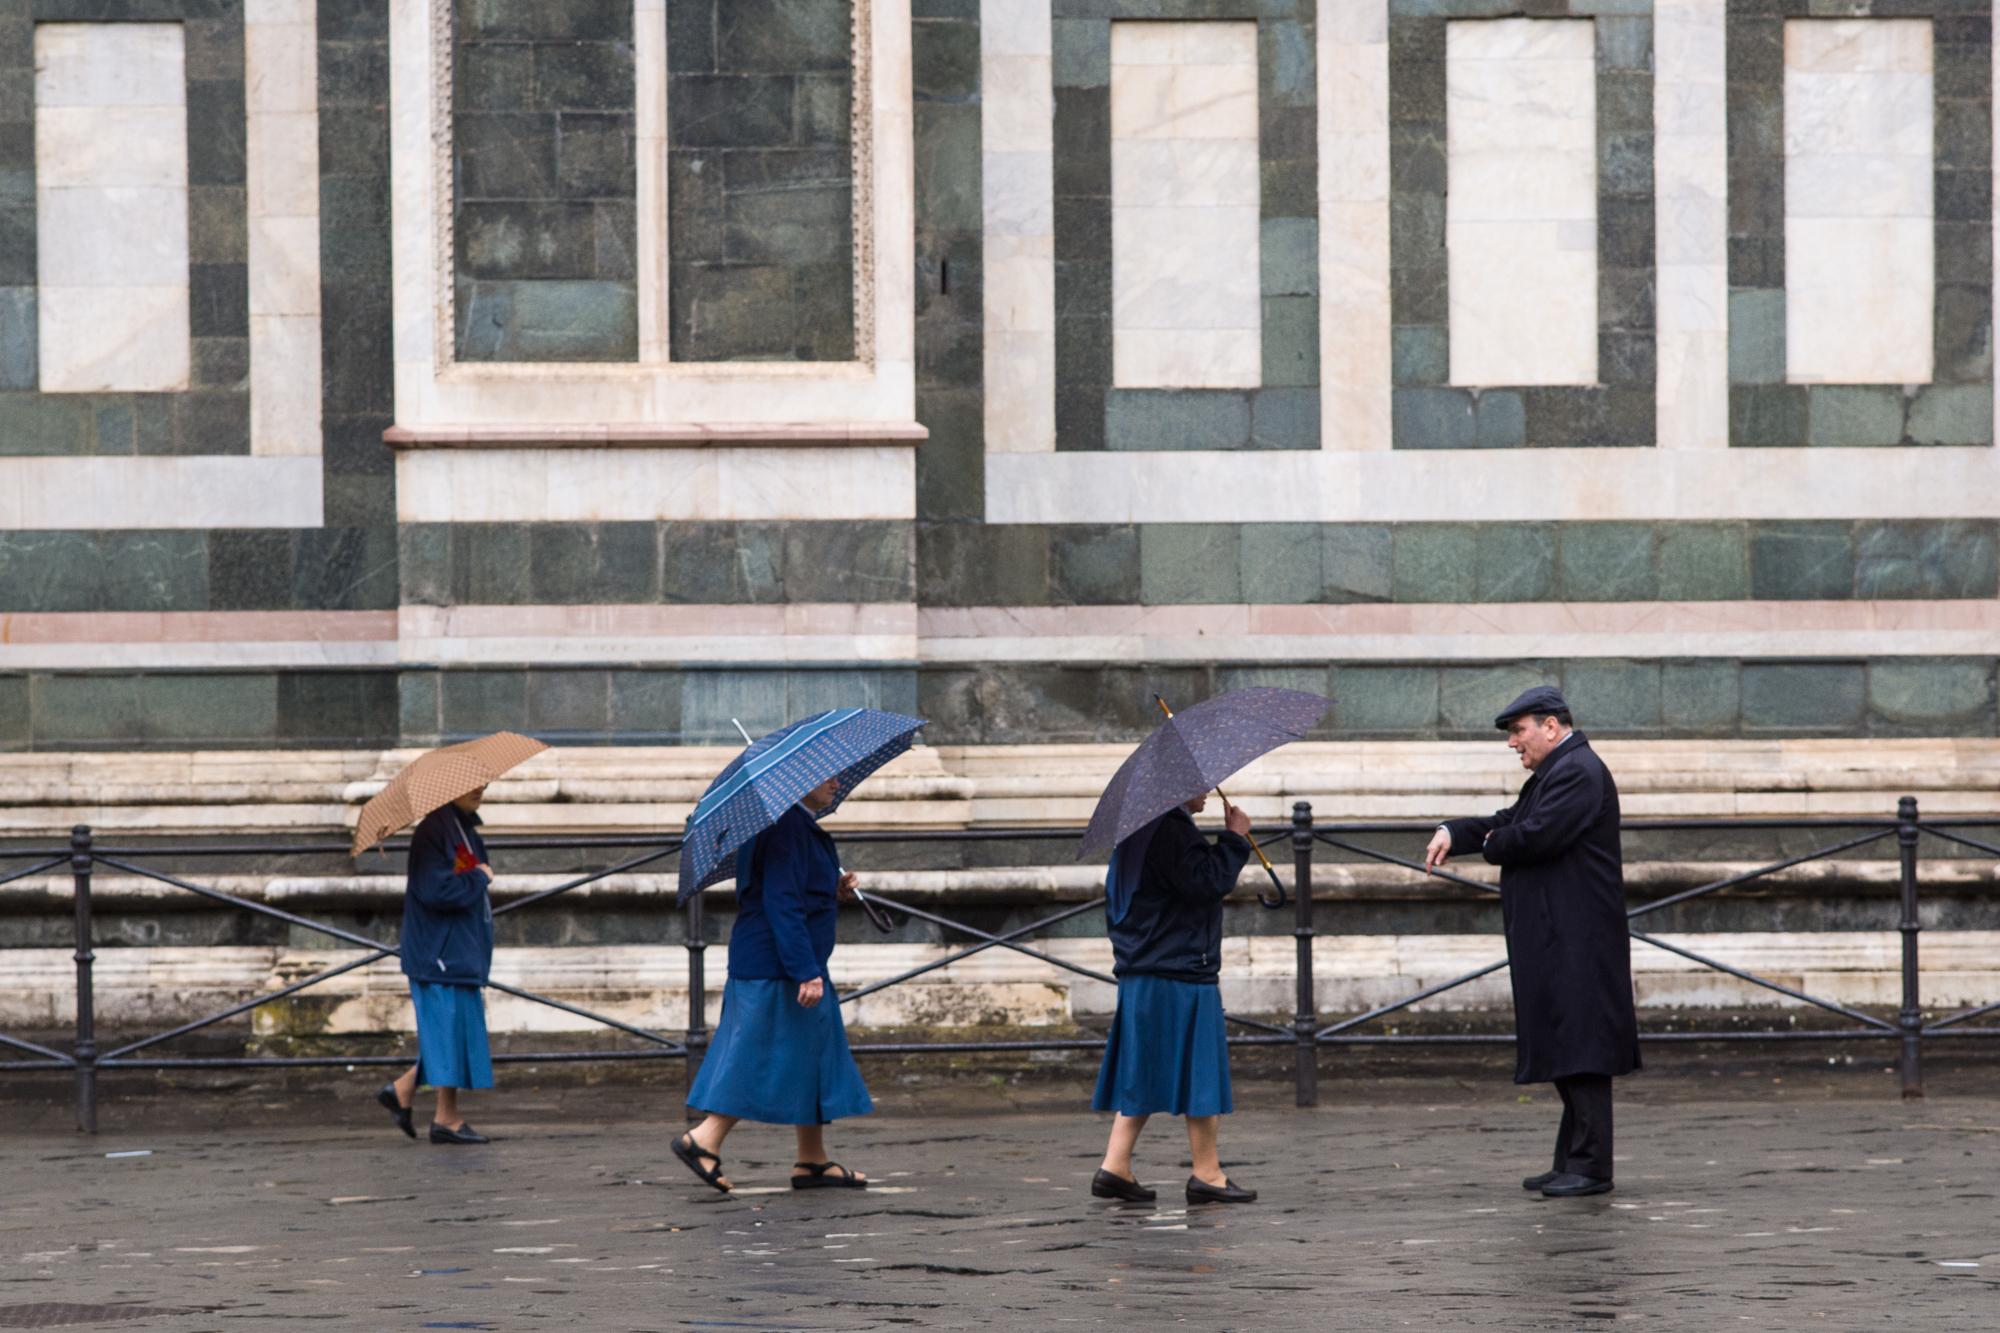 Nuns walking to morning prayers outside the Duomo